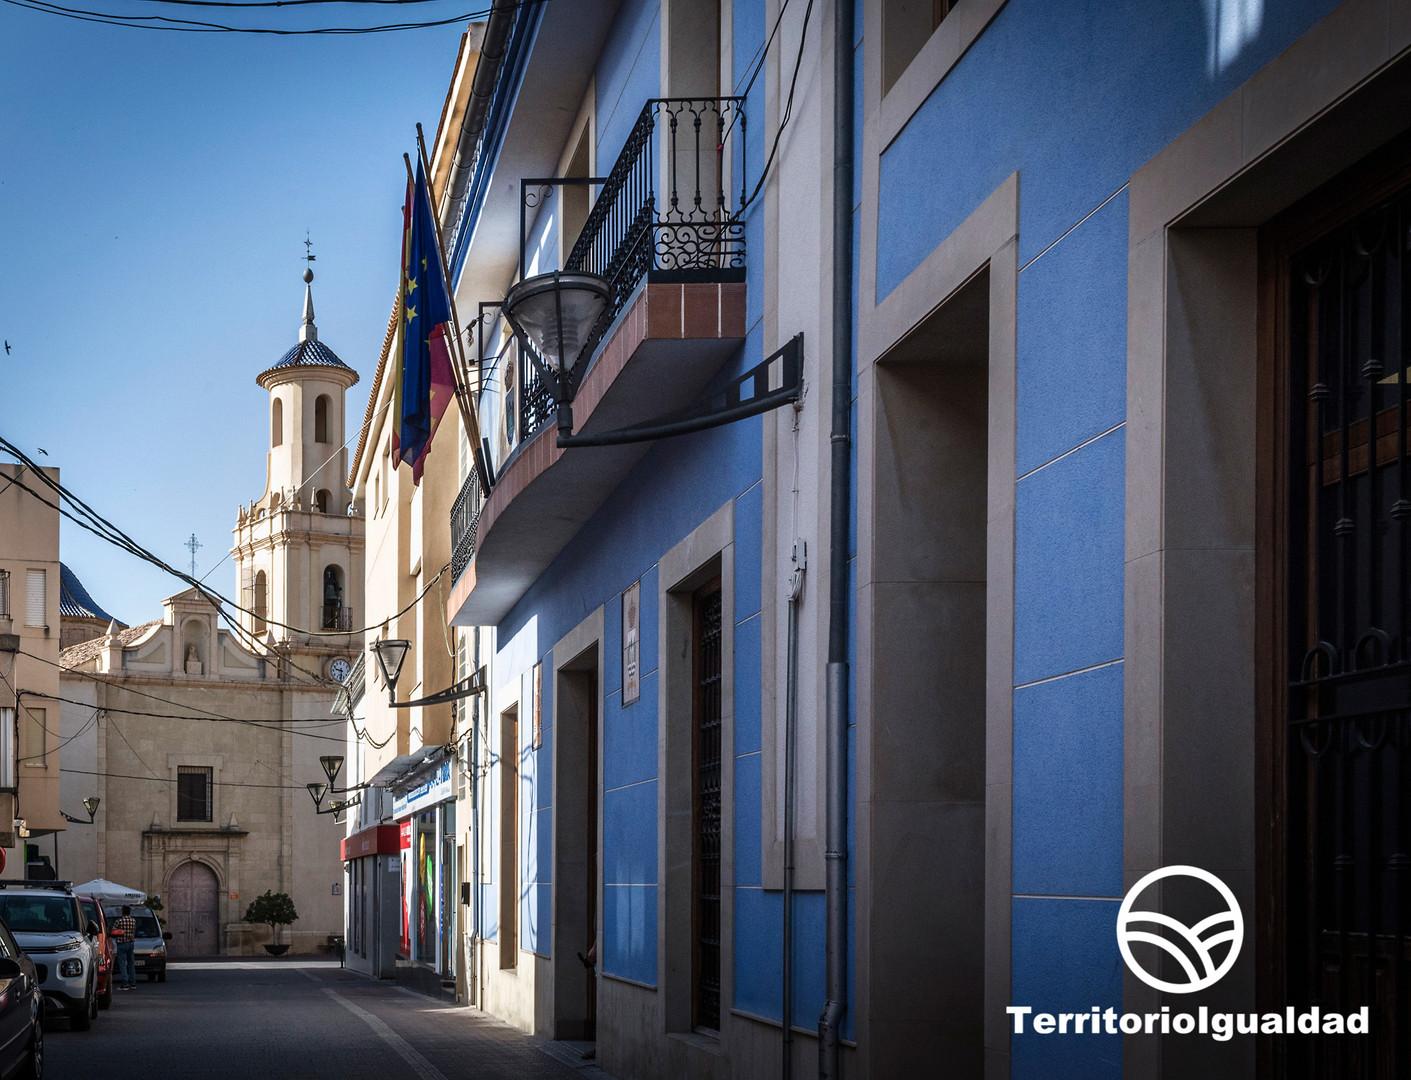 Fortuna. Calle del Ayuntamiento Fortuna.jpg